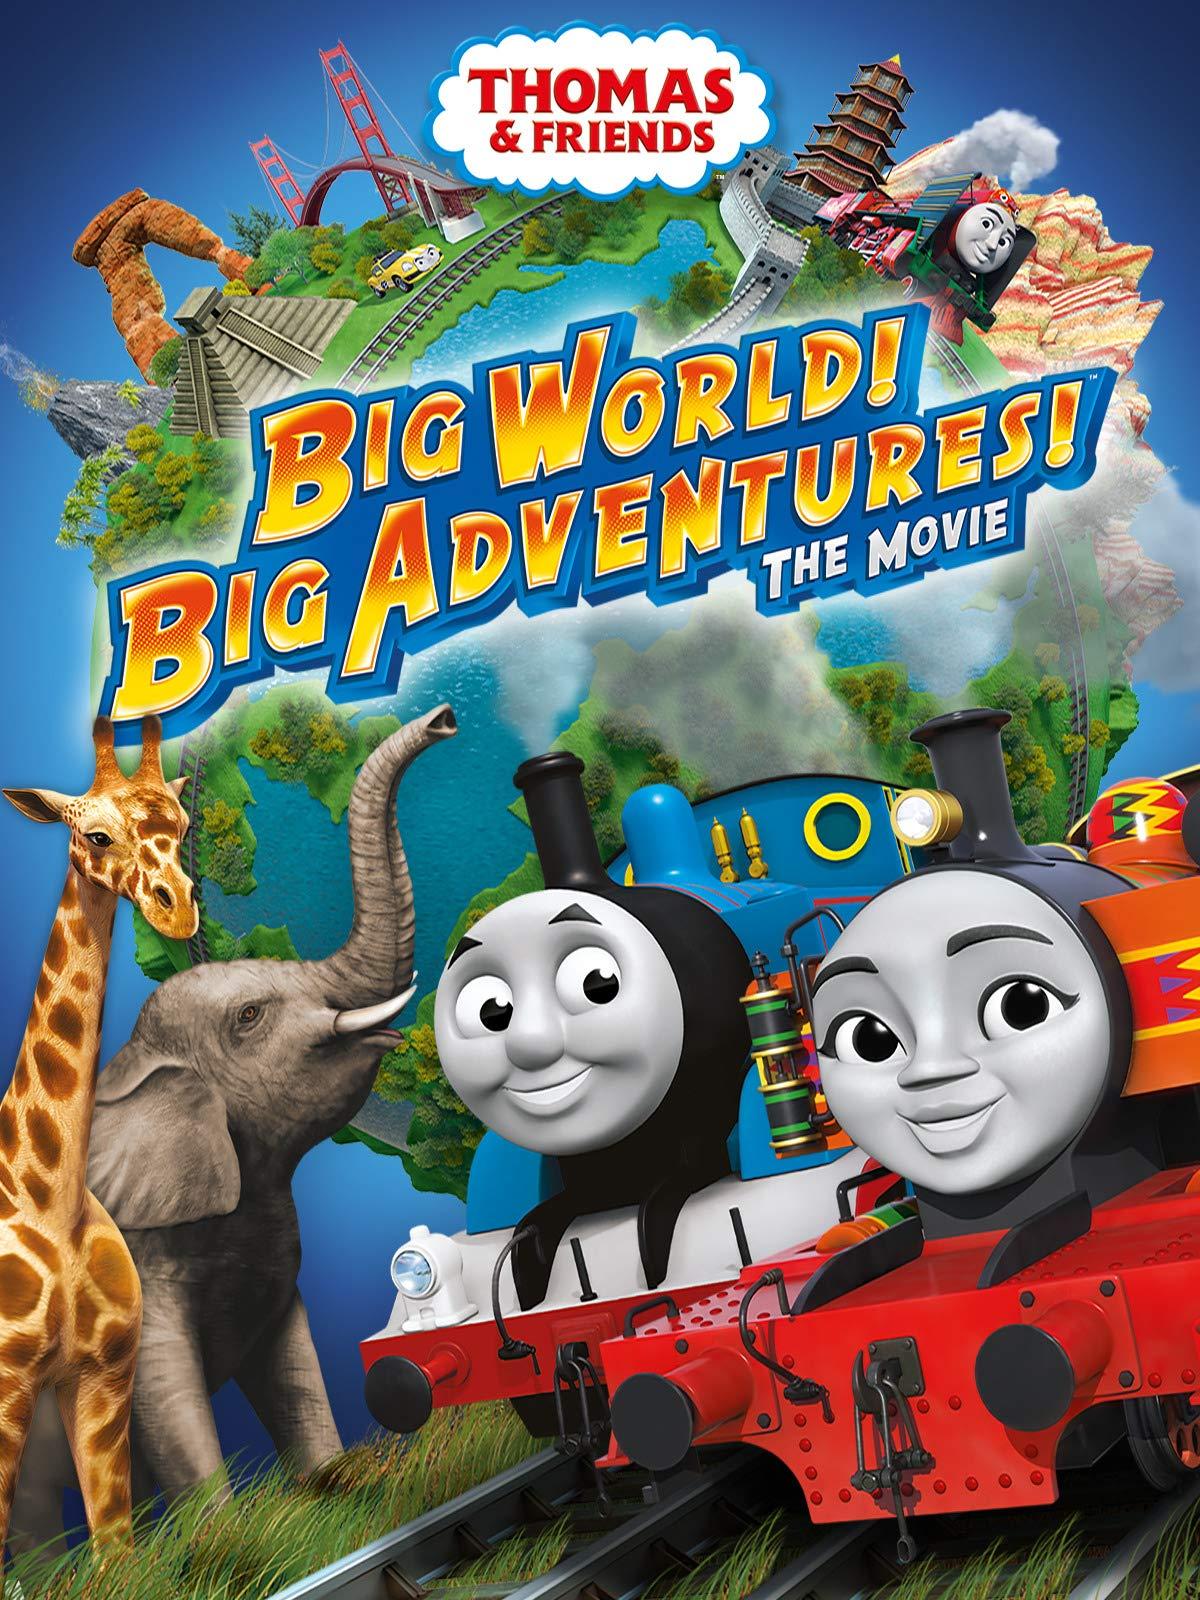 Thomas & Friends: Big World! Big Adventures! The Movie